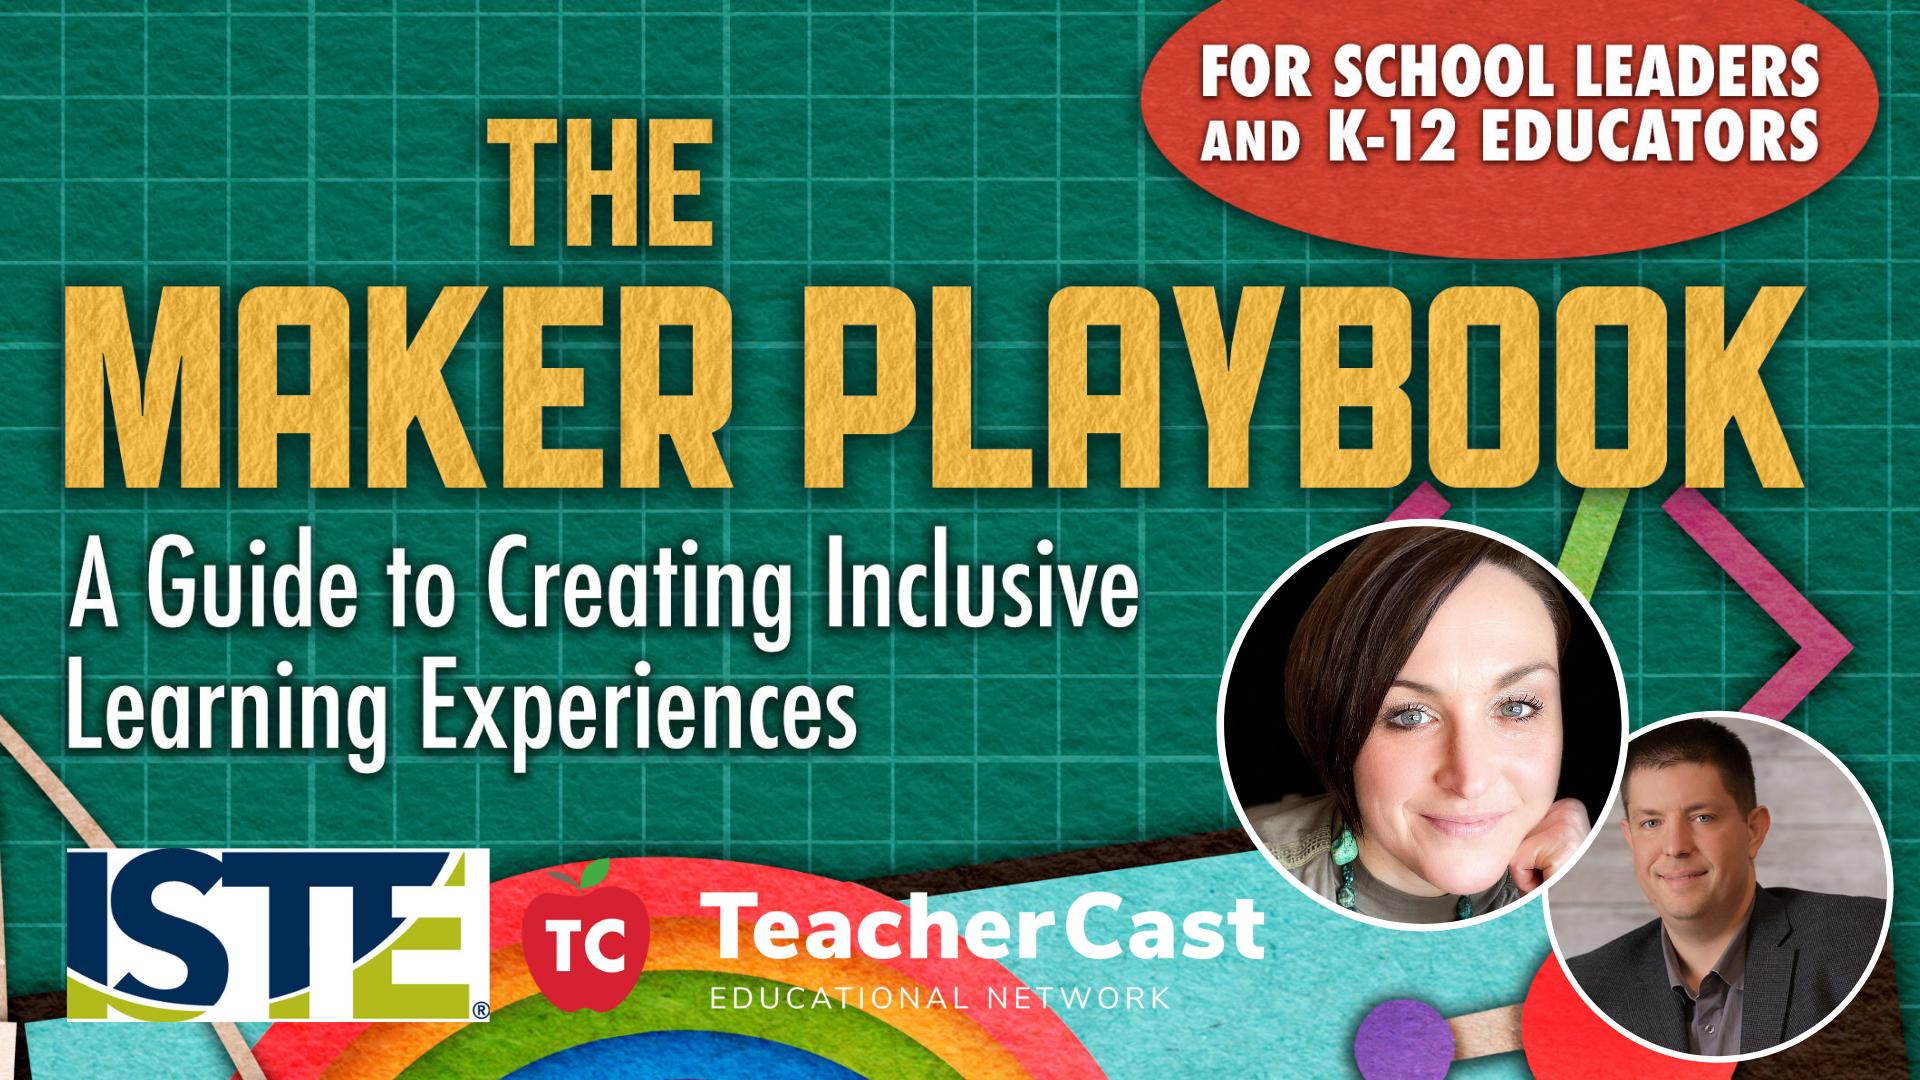 The Maker Playbook: Caroline Haebig